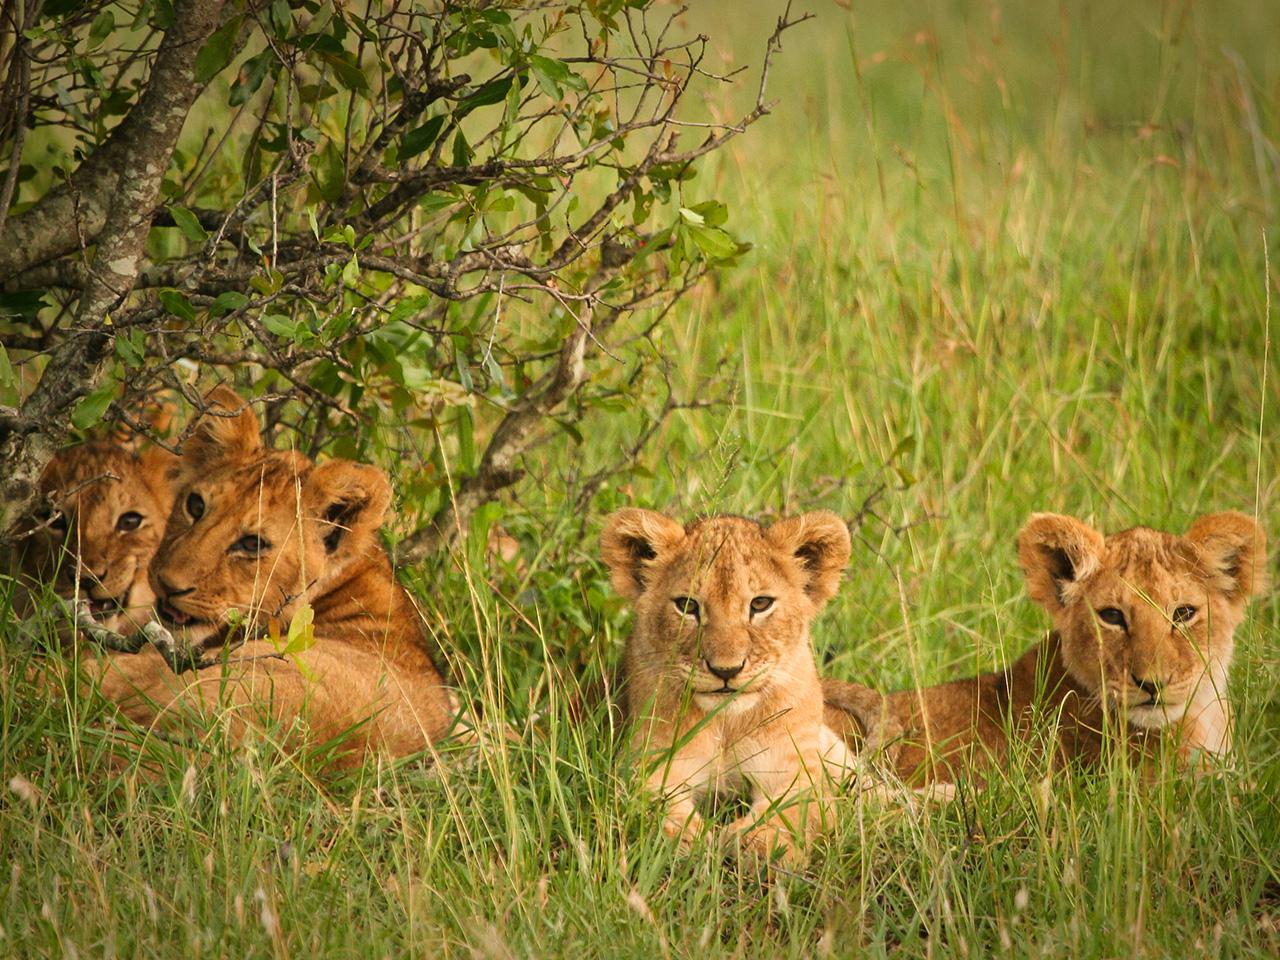 Listopedia: The Wildlife Watcher's Bucket List